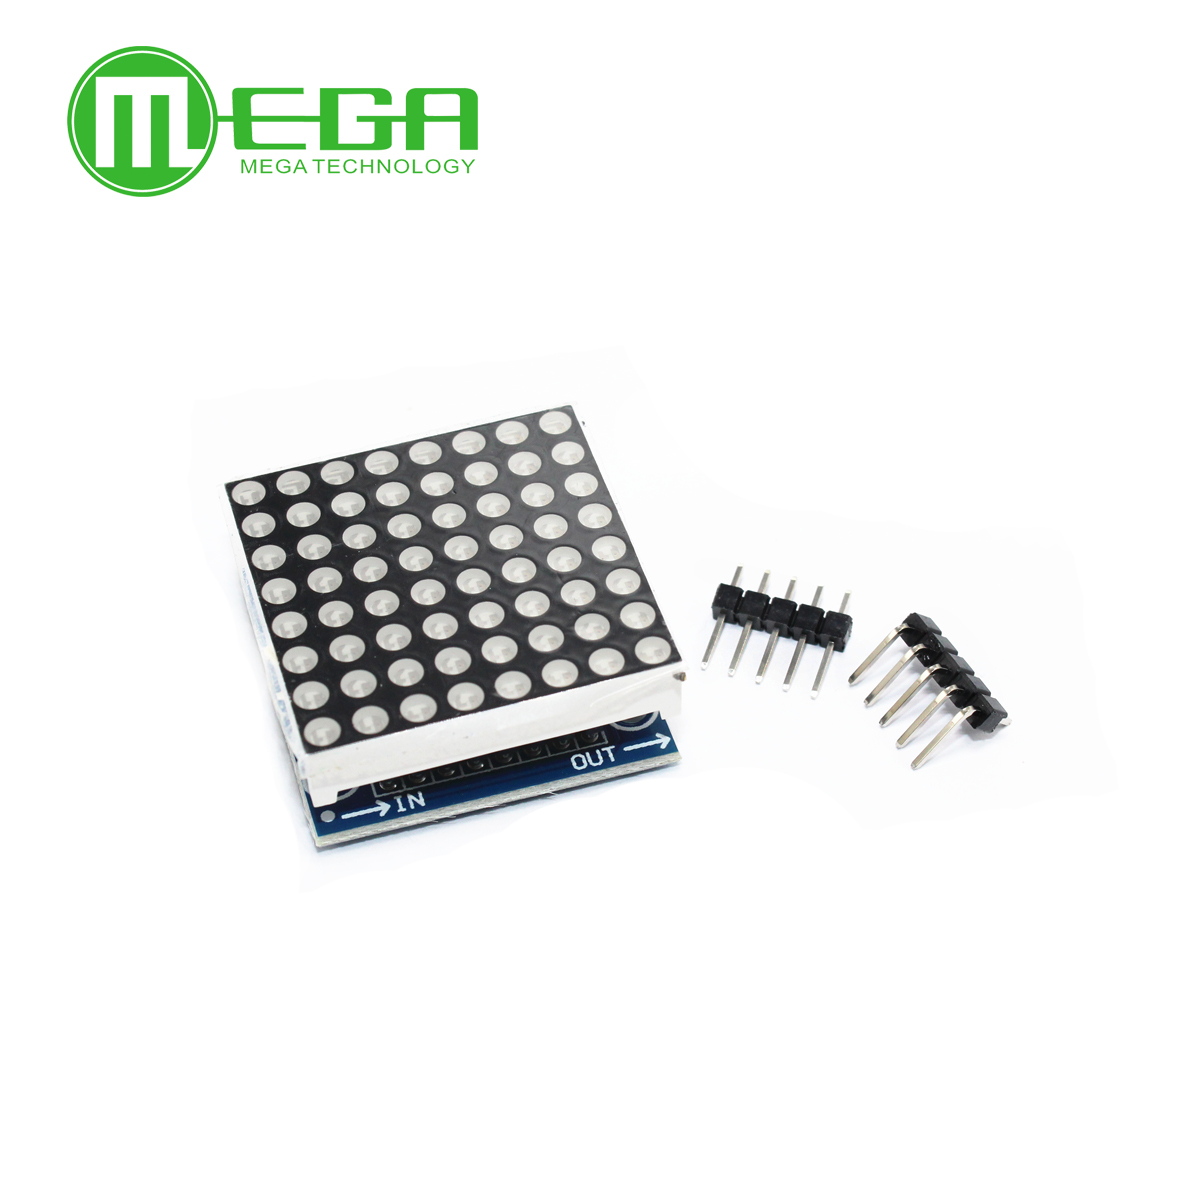 MAX7219 dot matrix modul mikrocontroller modul display modul fertig waren